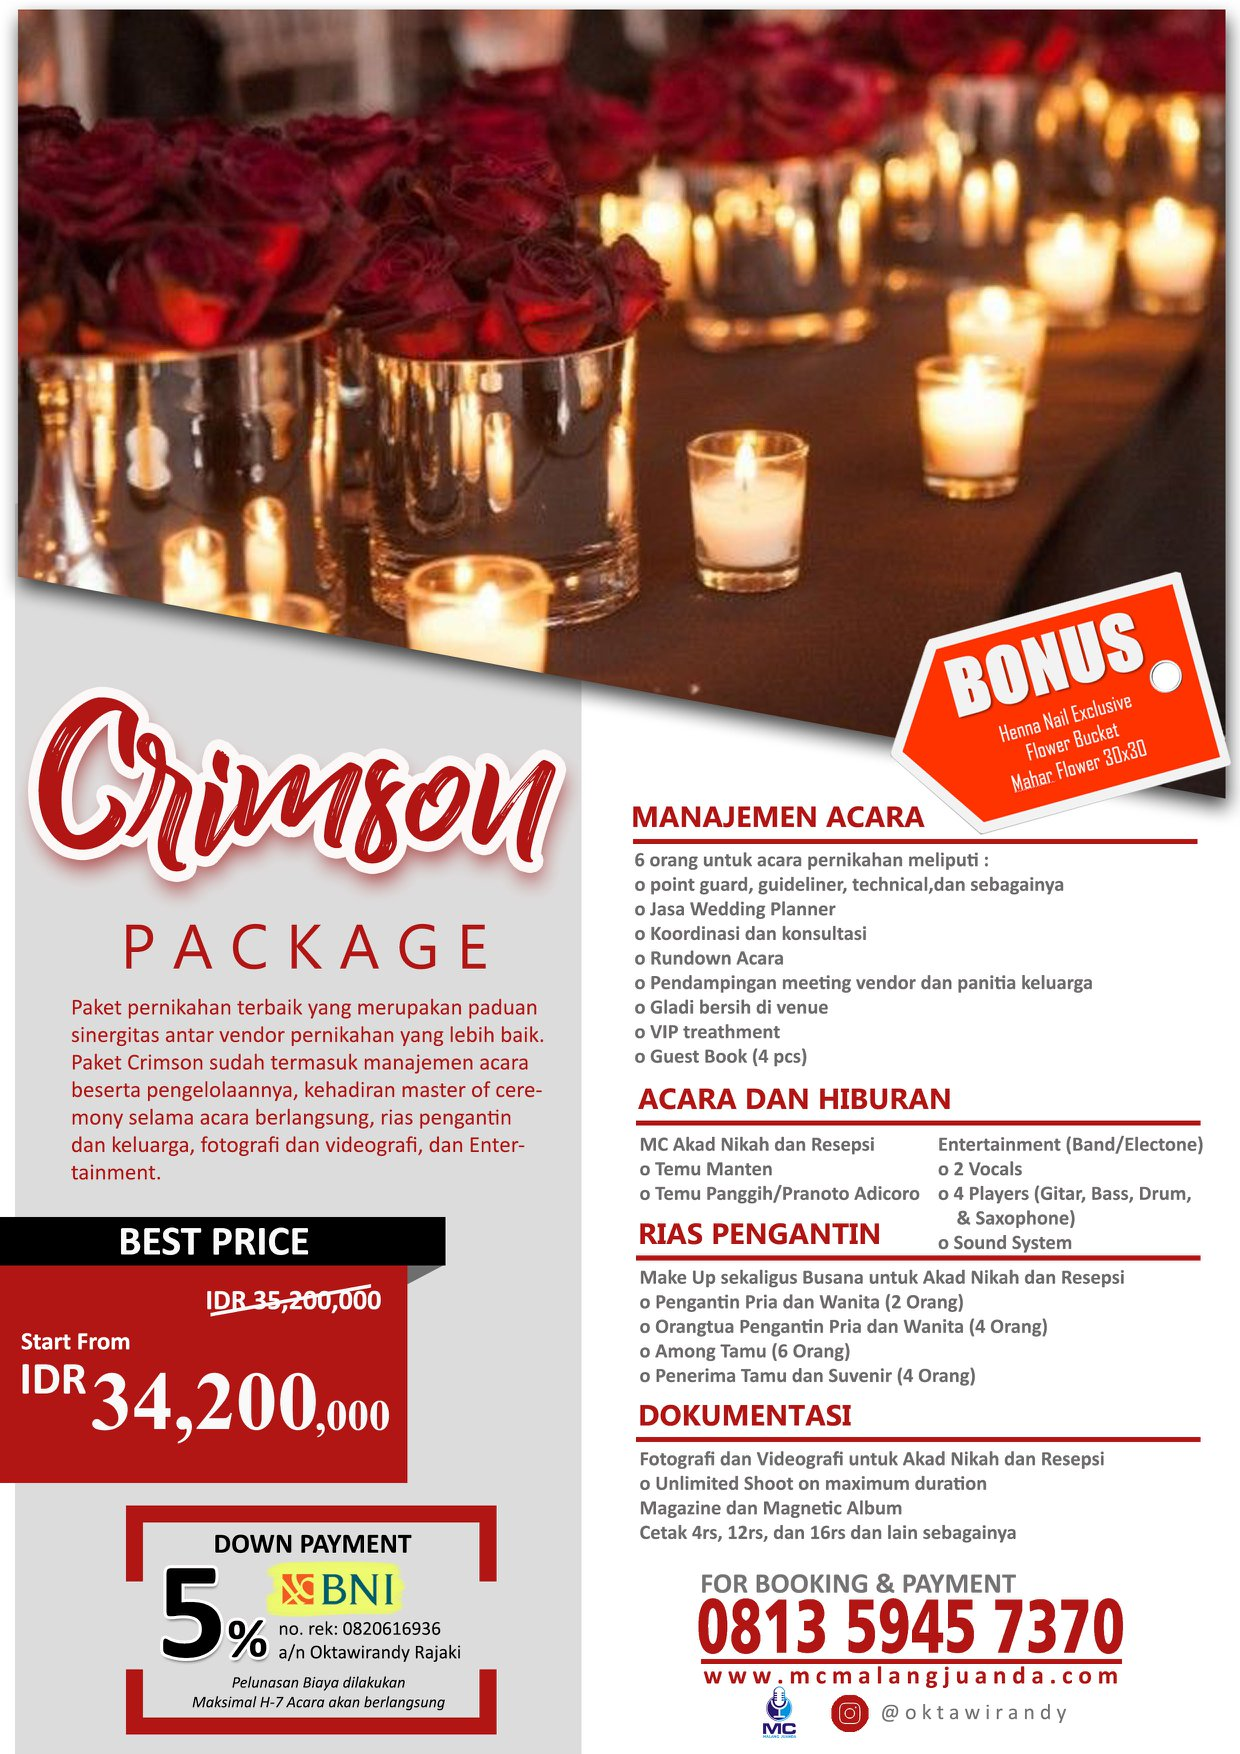 Harga Paket Wedding Organizer di Malang